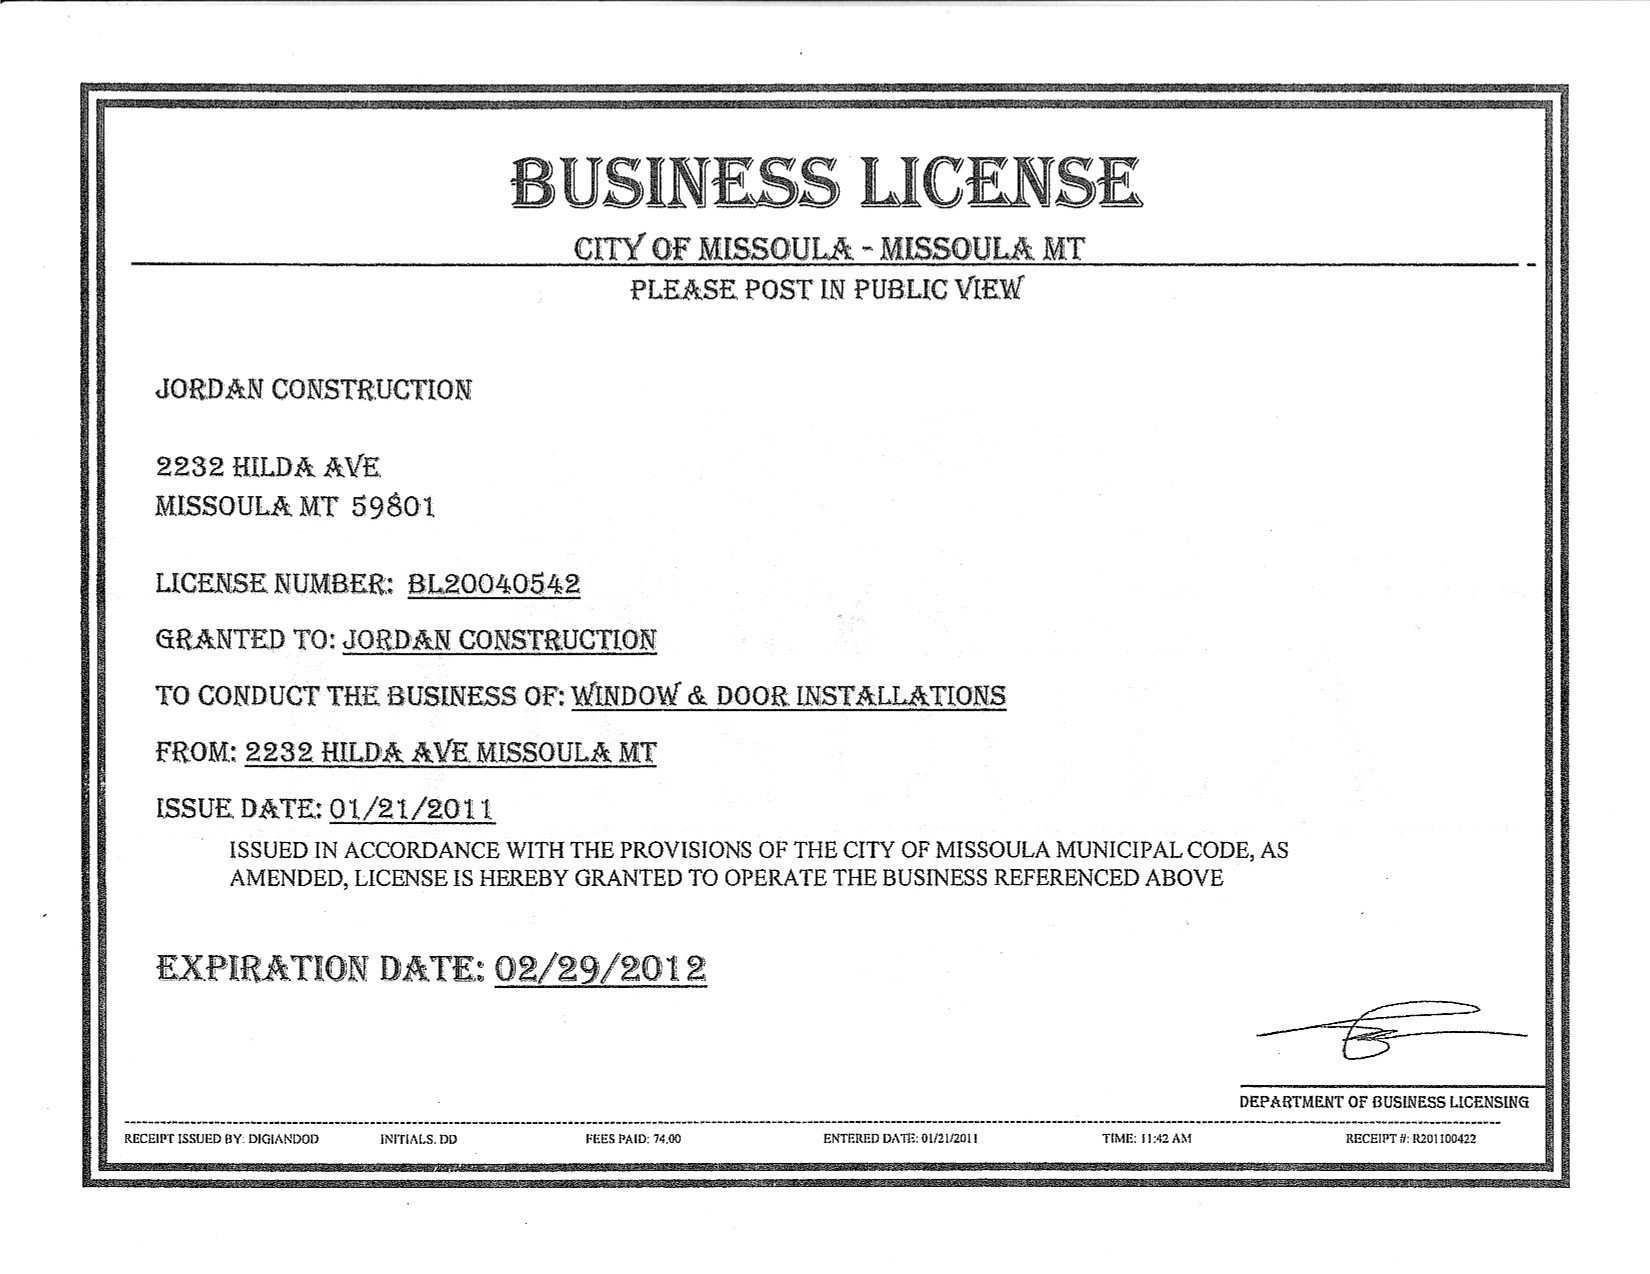 license certificate template registration sample nj samples templates certificates field track fresh preacher ordination ga printable examples